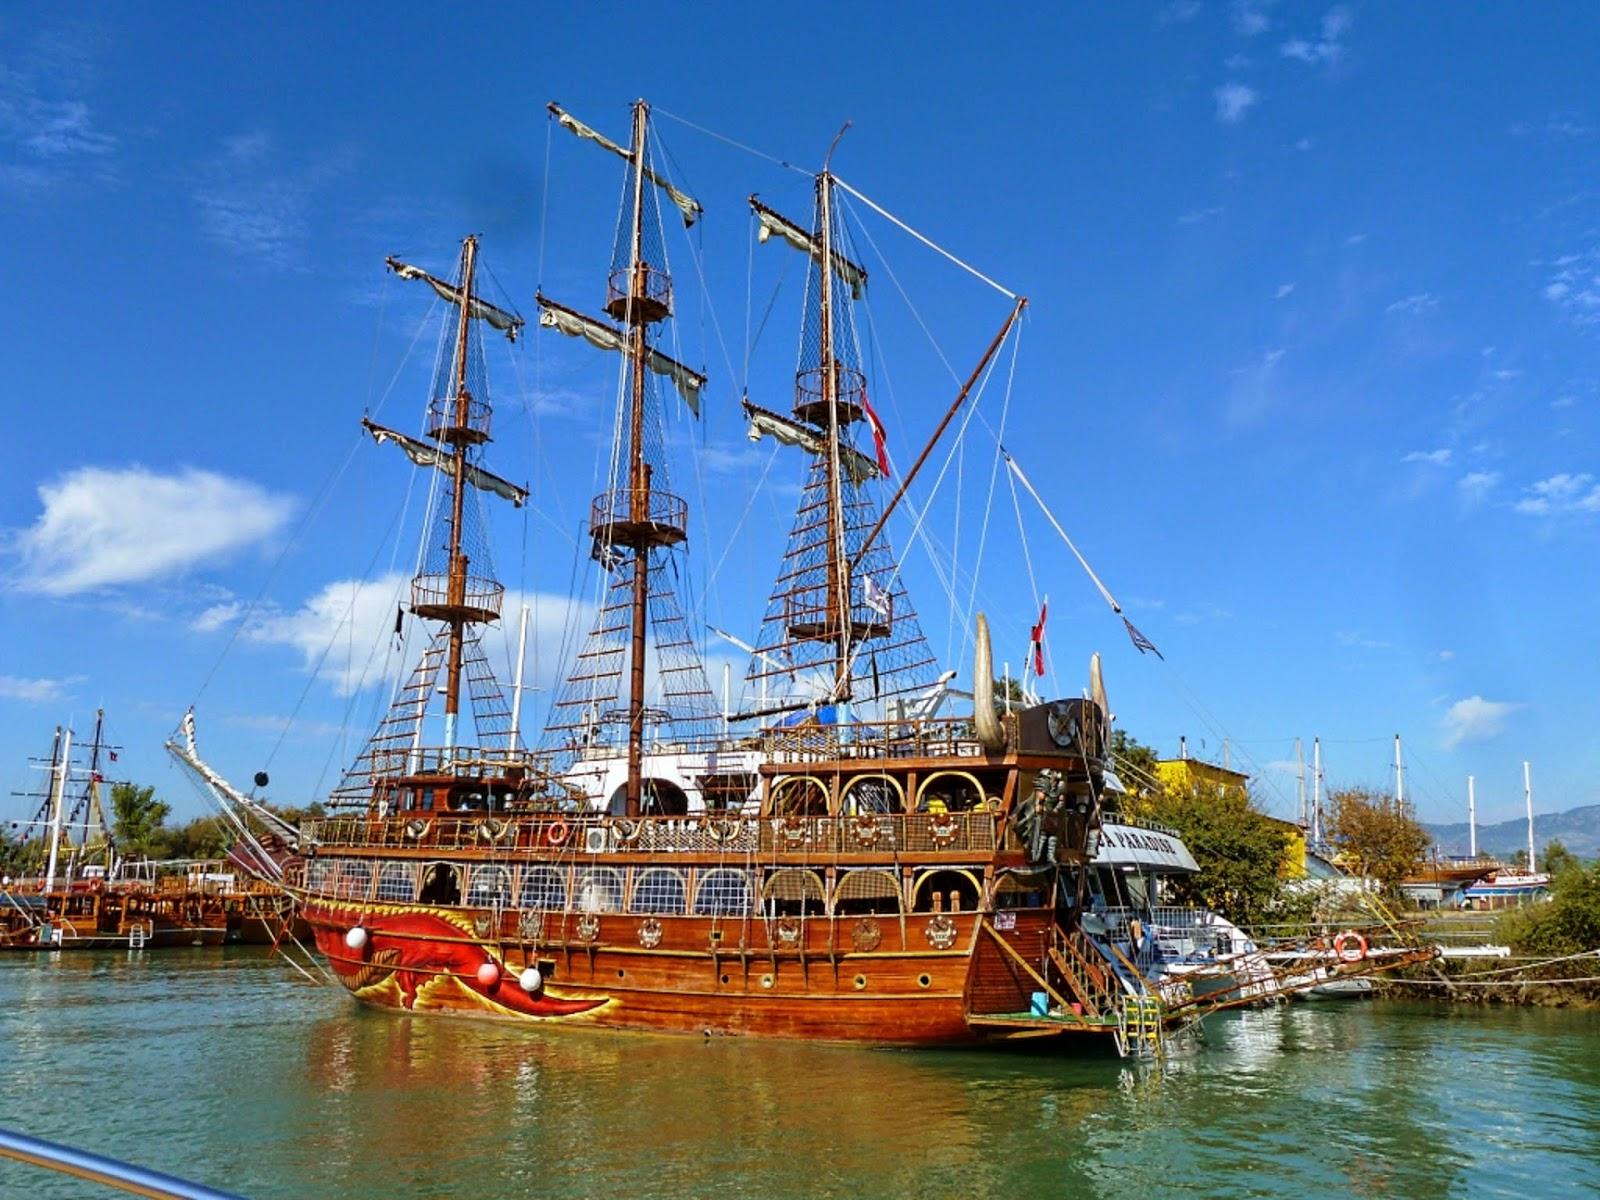 Very Beautiful Ship Images HD Wallpaper - all 4u wallpaper